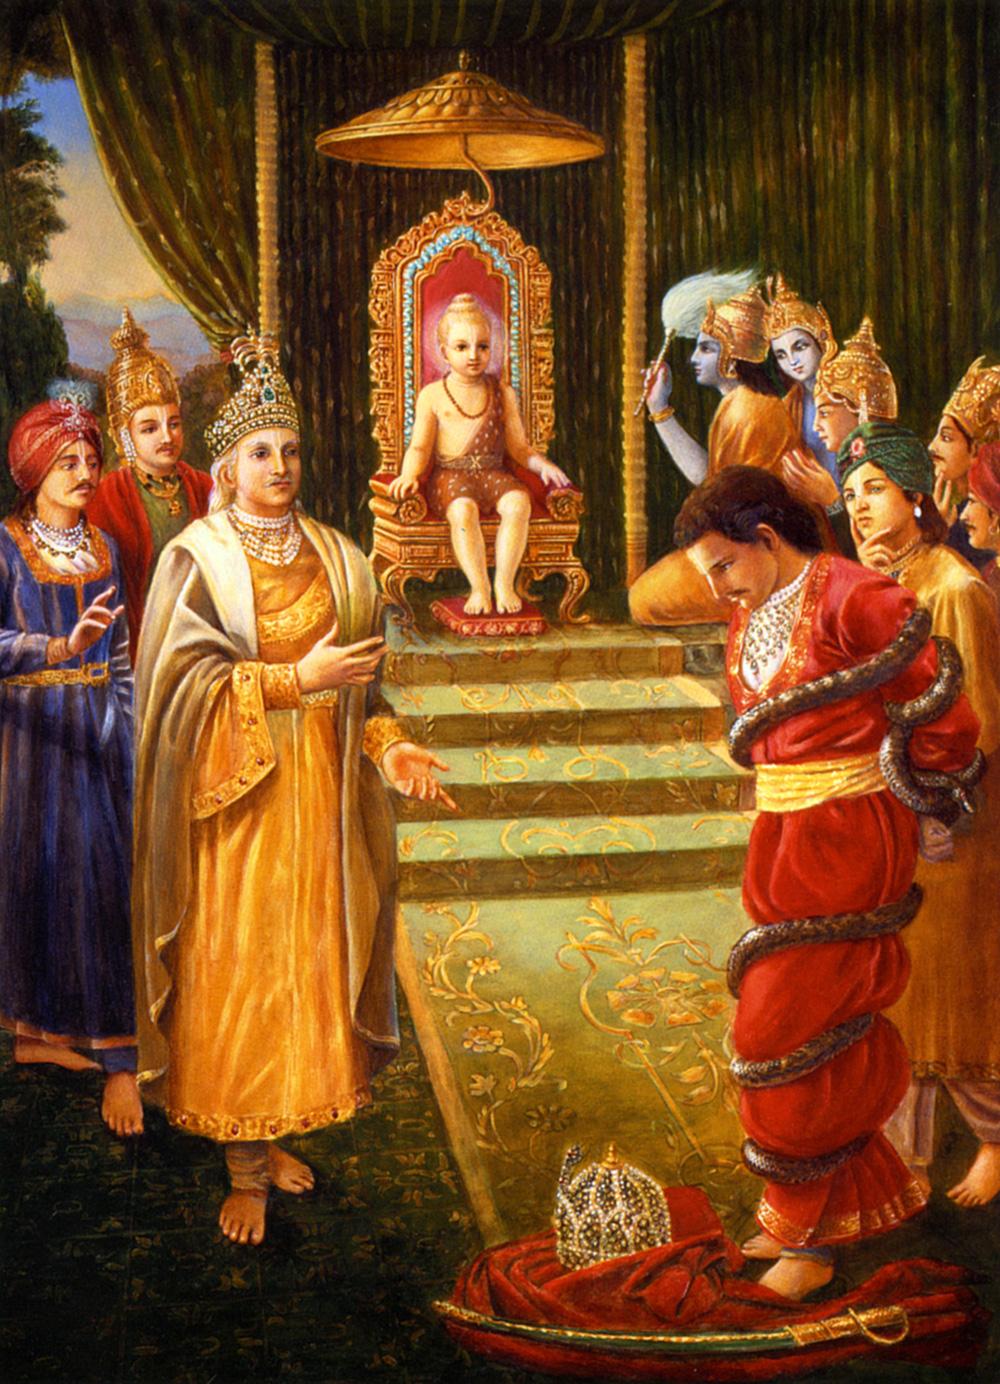 Господь Ваманадева (Дашаватара)